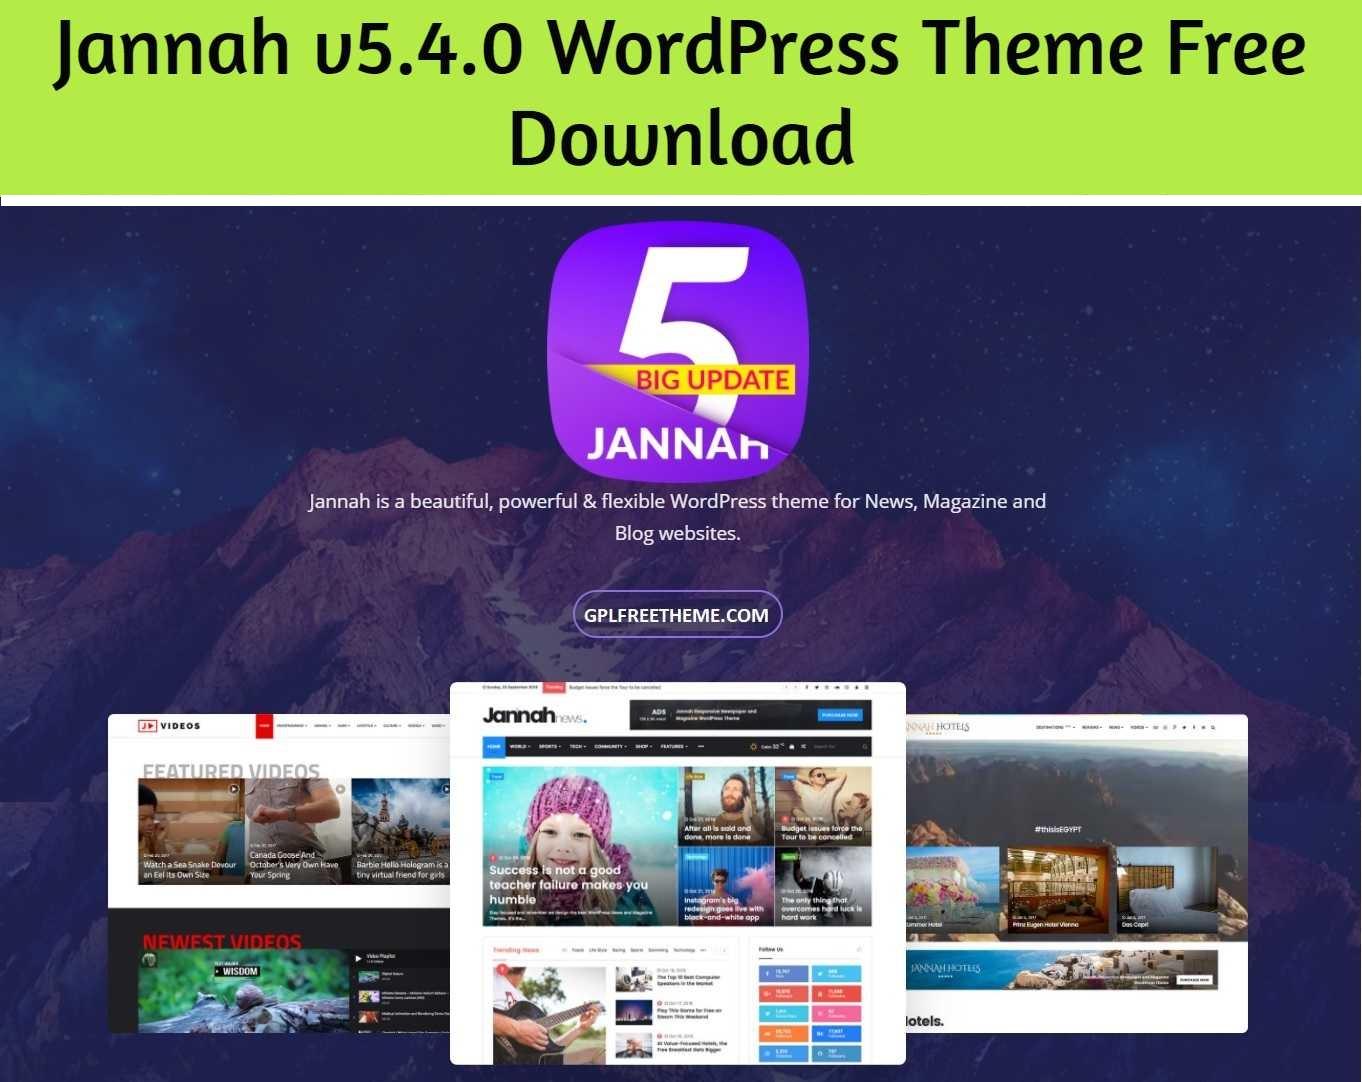 Jannah 5.4.0 WordPress Theme Free Download